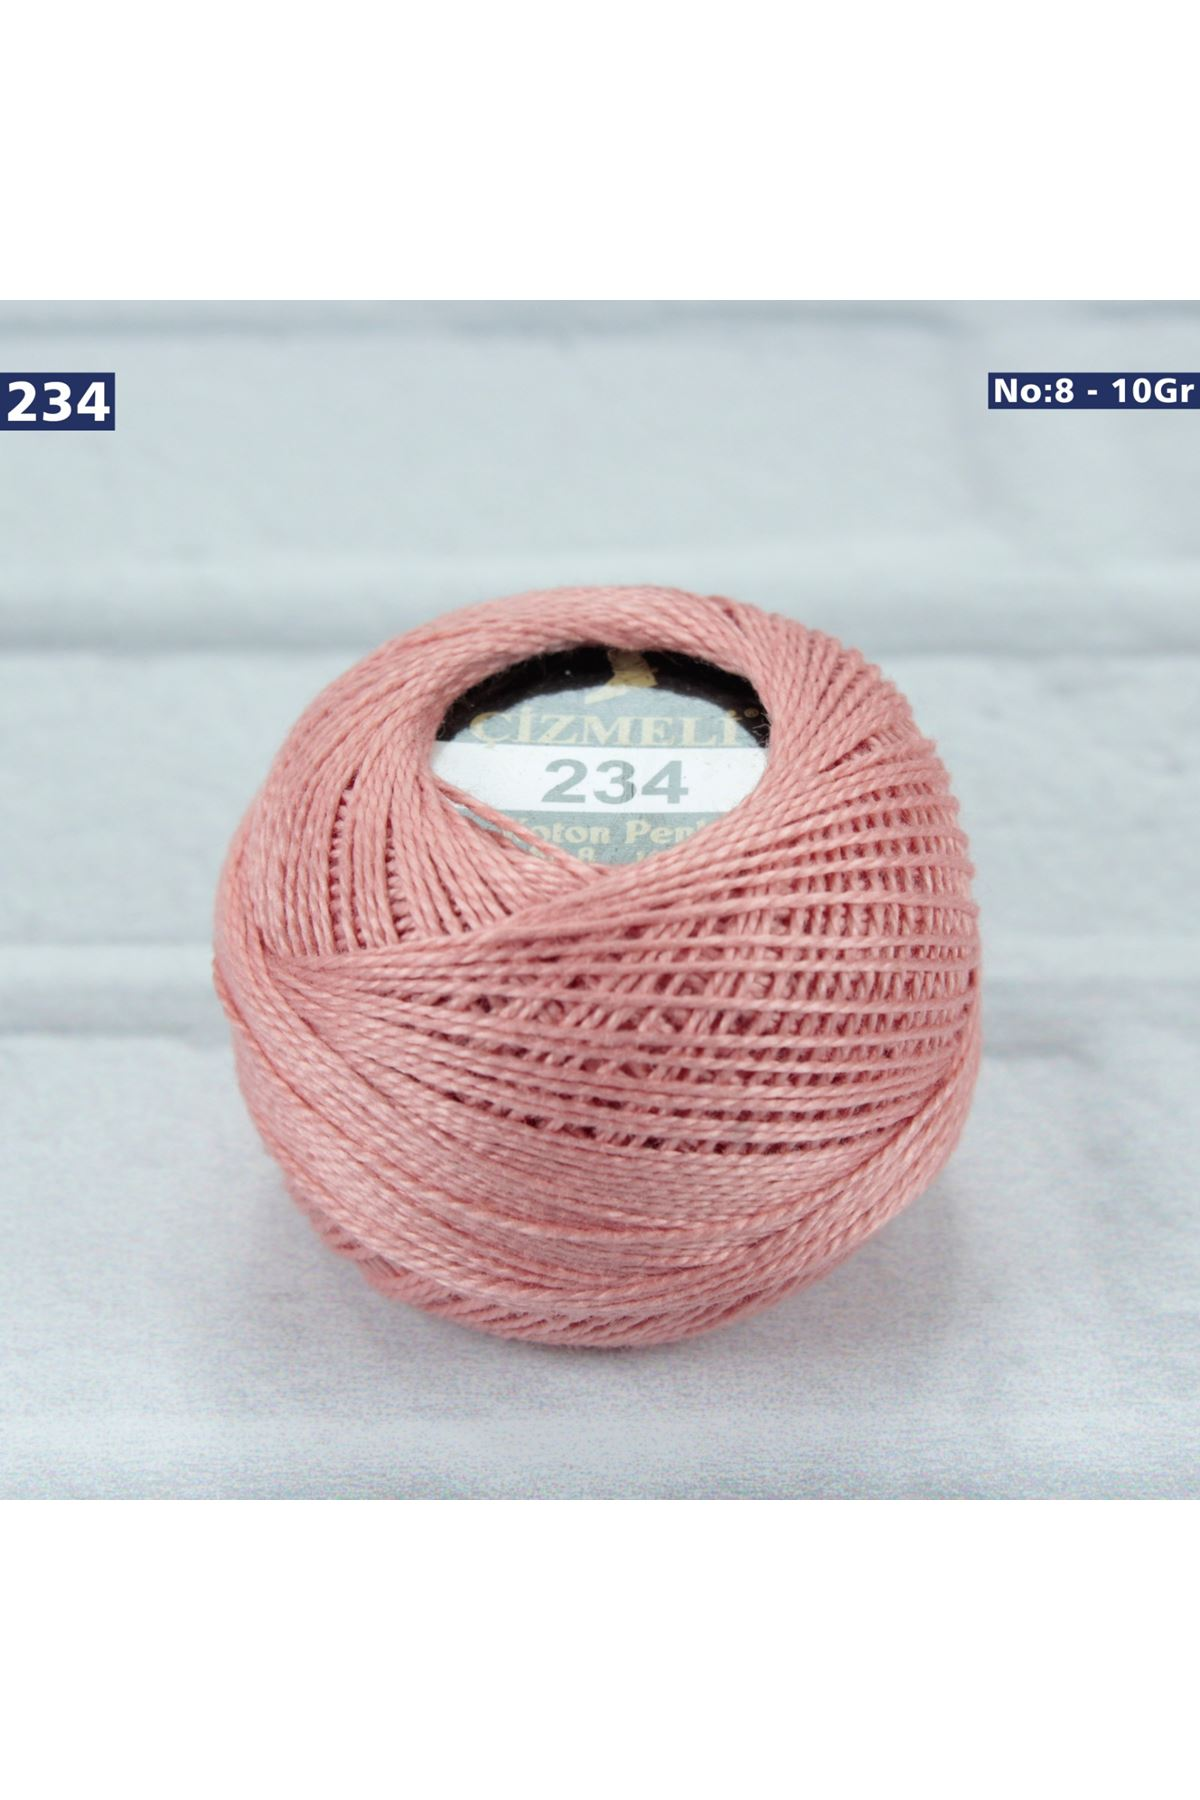 Çizmeli Cotton Perle Nakış İpliği No: 234